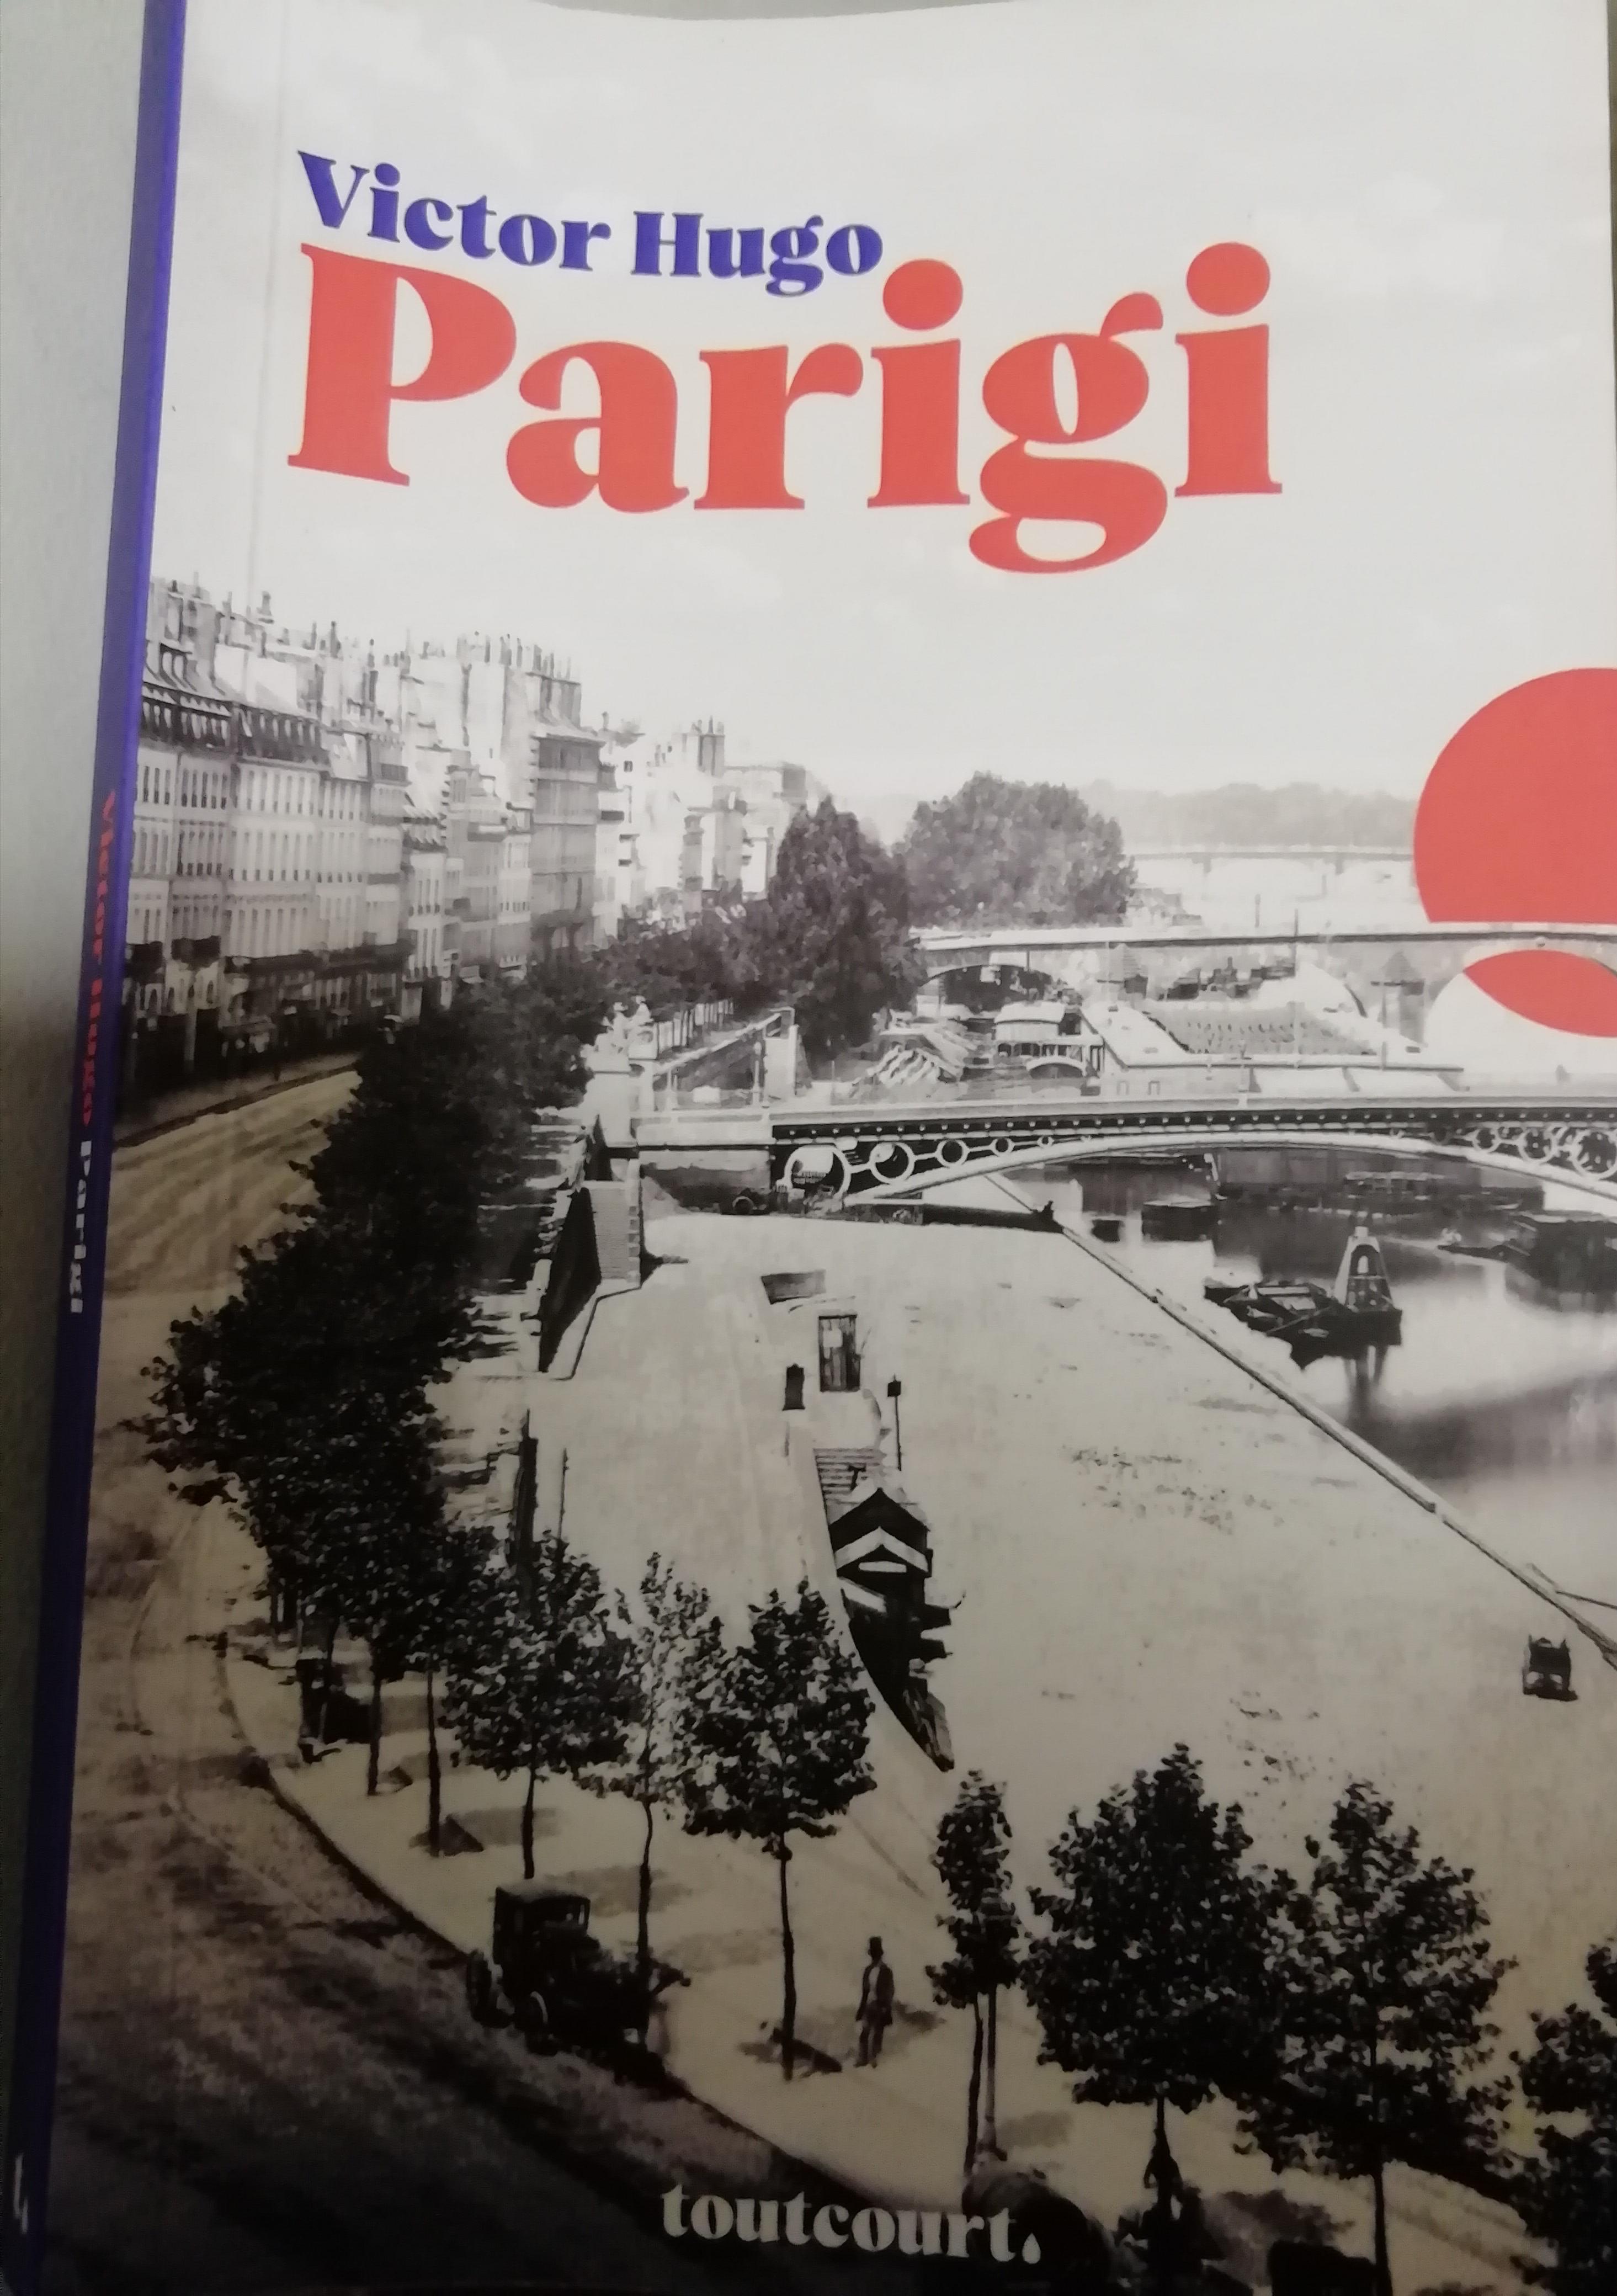 siti di incontri gratuiti Parigi